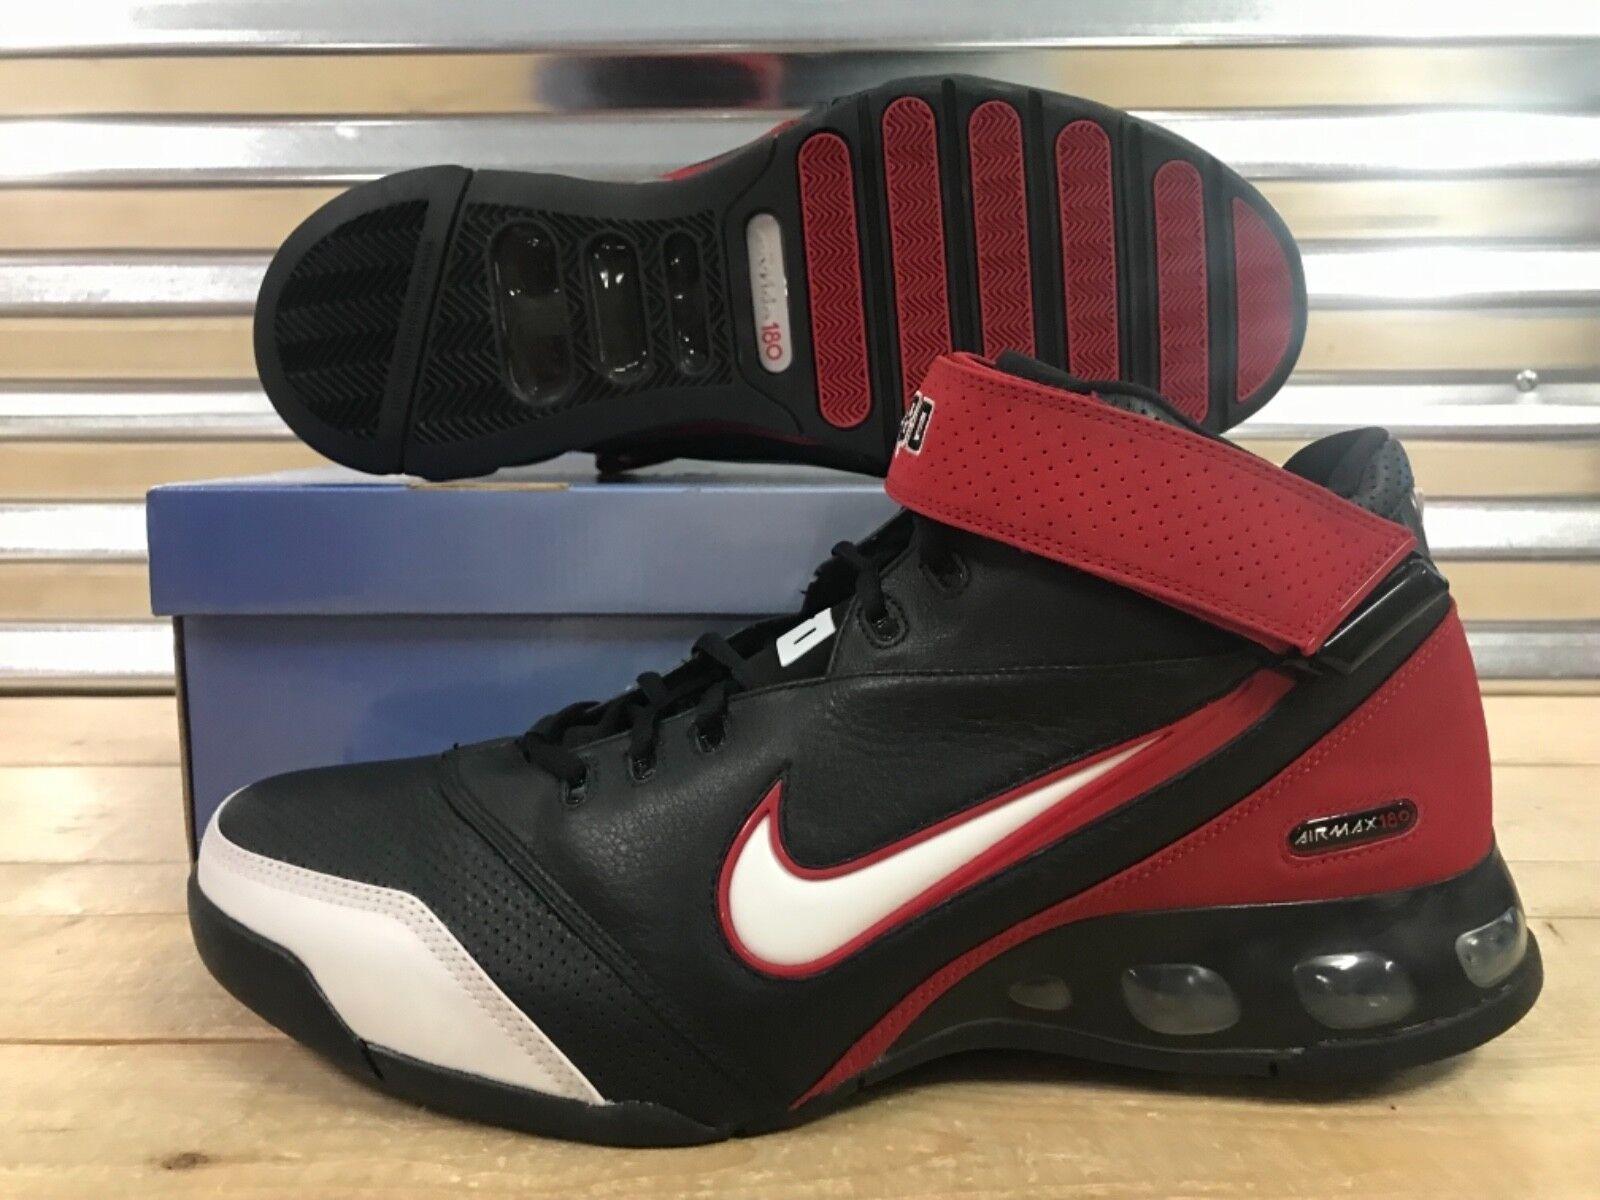 Nike Air Max 180 Zach Randolph PE shoes Z-Bo Promo Sample Black Red White SZ 15